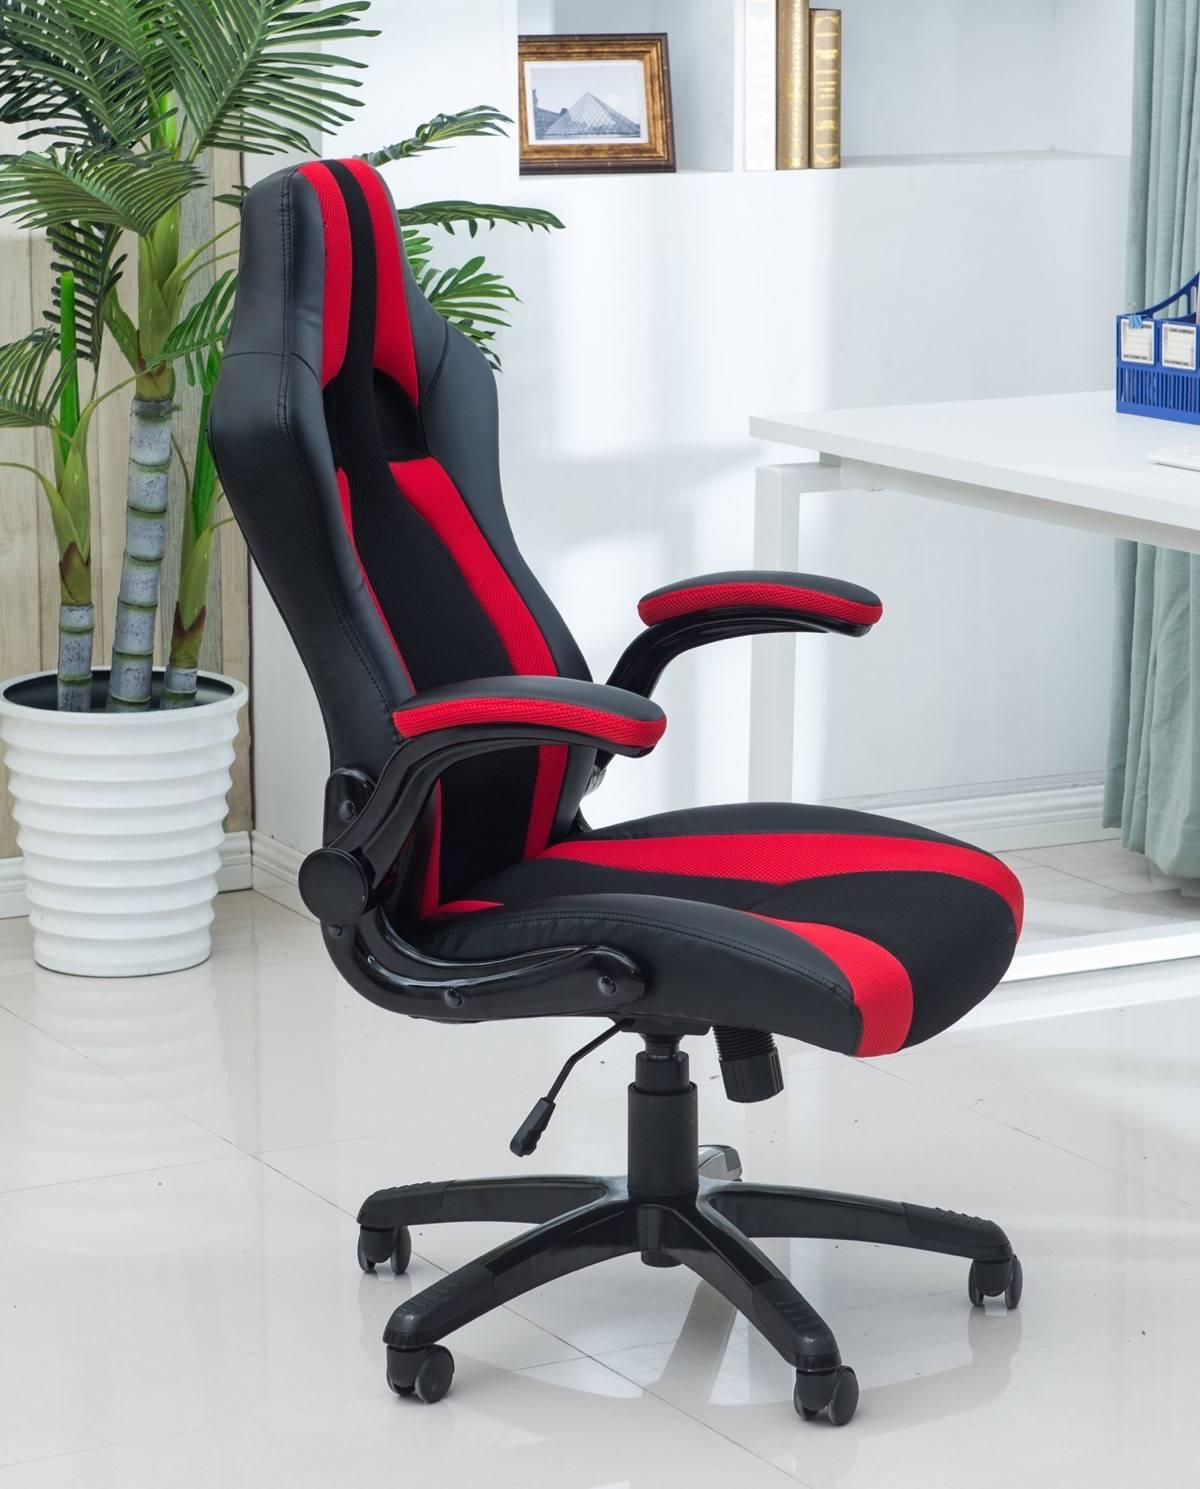 latif chaise de bureau sport fauteuil racing. Black Bedroom Furniture Sets. Home Design Ideas